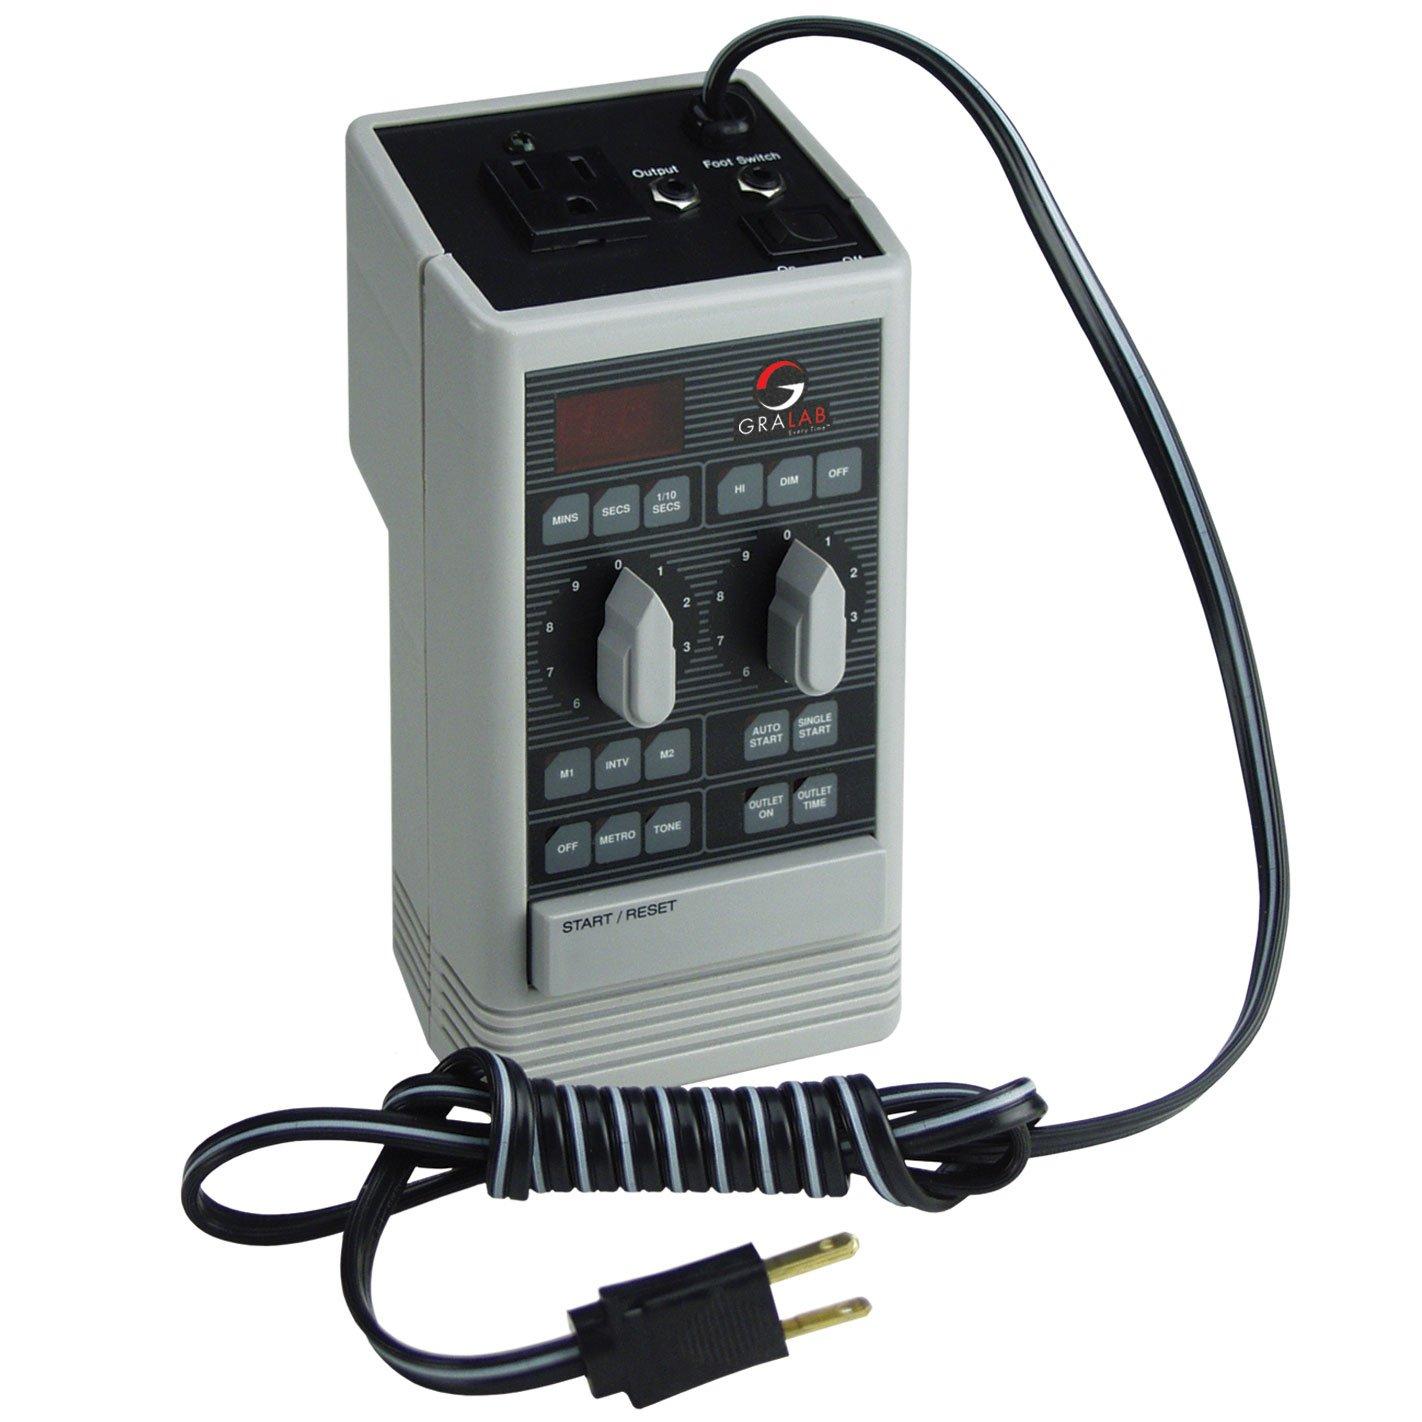 71oNGszBMKL._SL1422_ gralab model 451 high accuracy digital electronic timer, 0 01  at soozxer.org